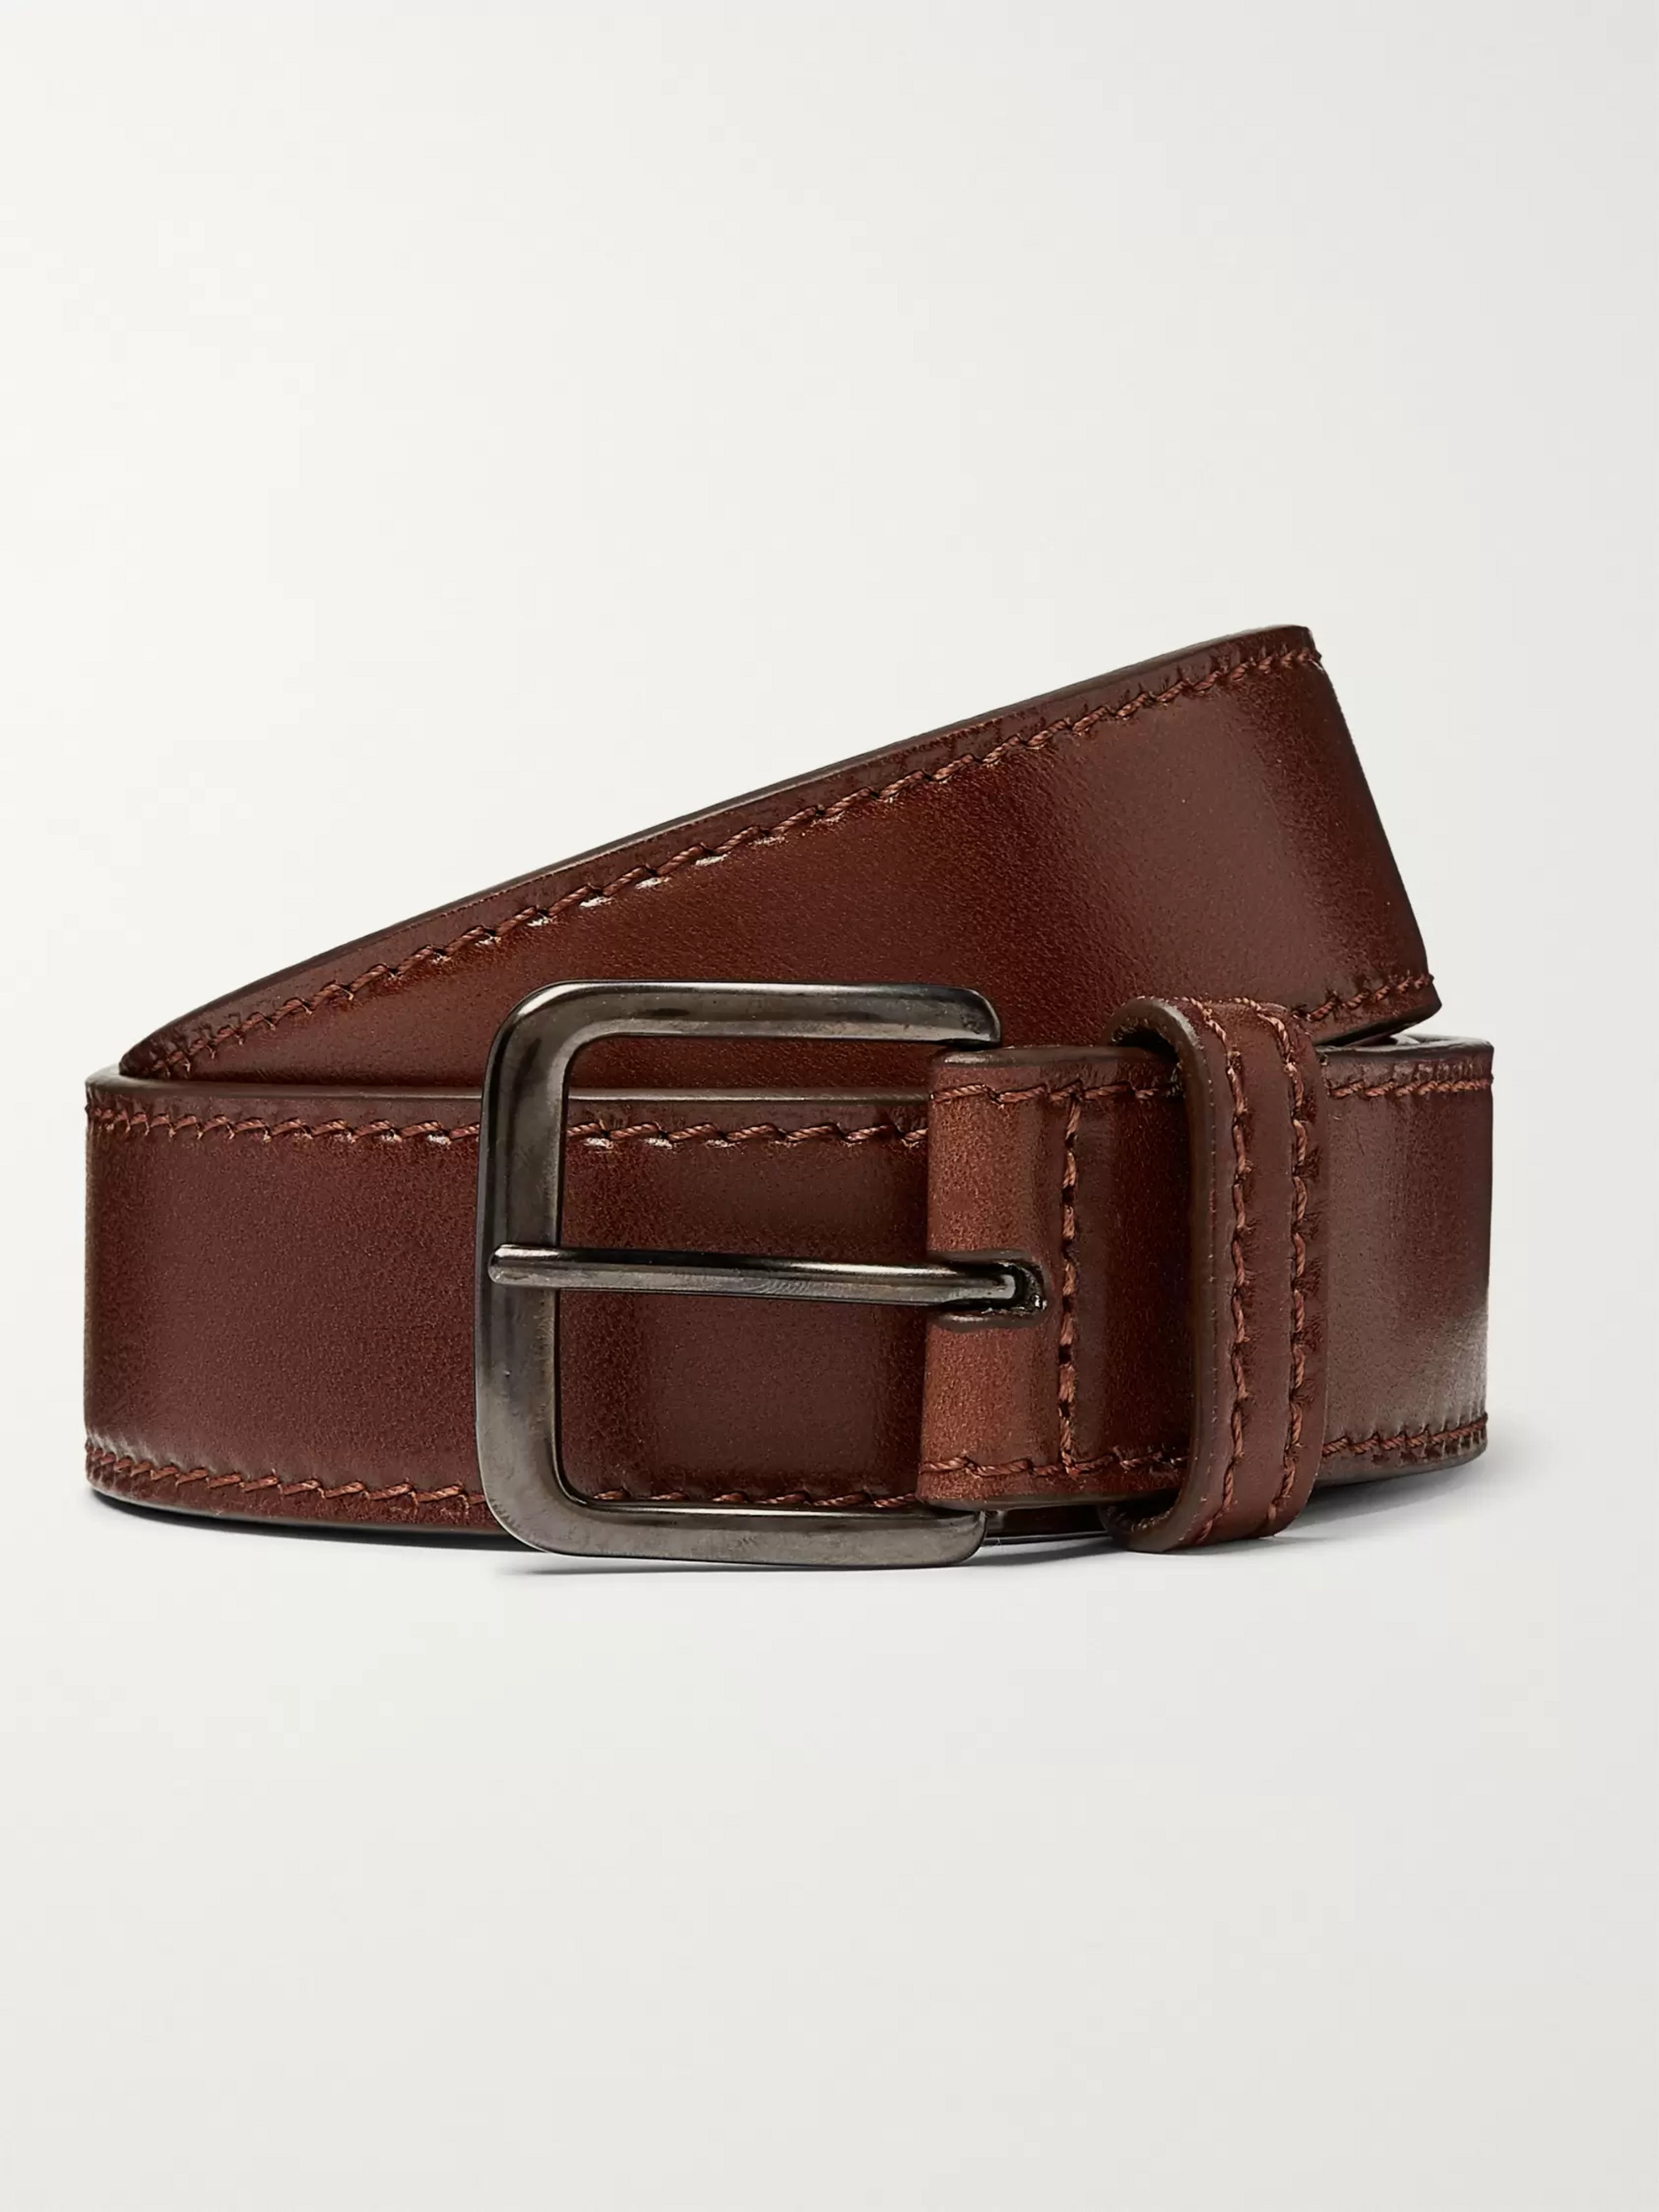 344a0b2e0 Belts for Men | Designer Accessories | MR PORTER